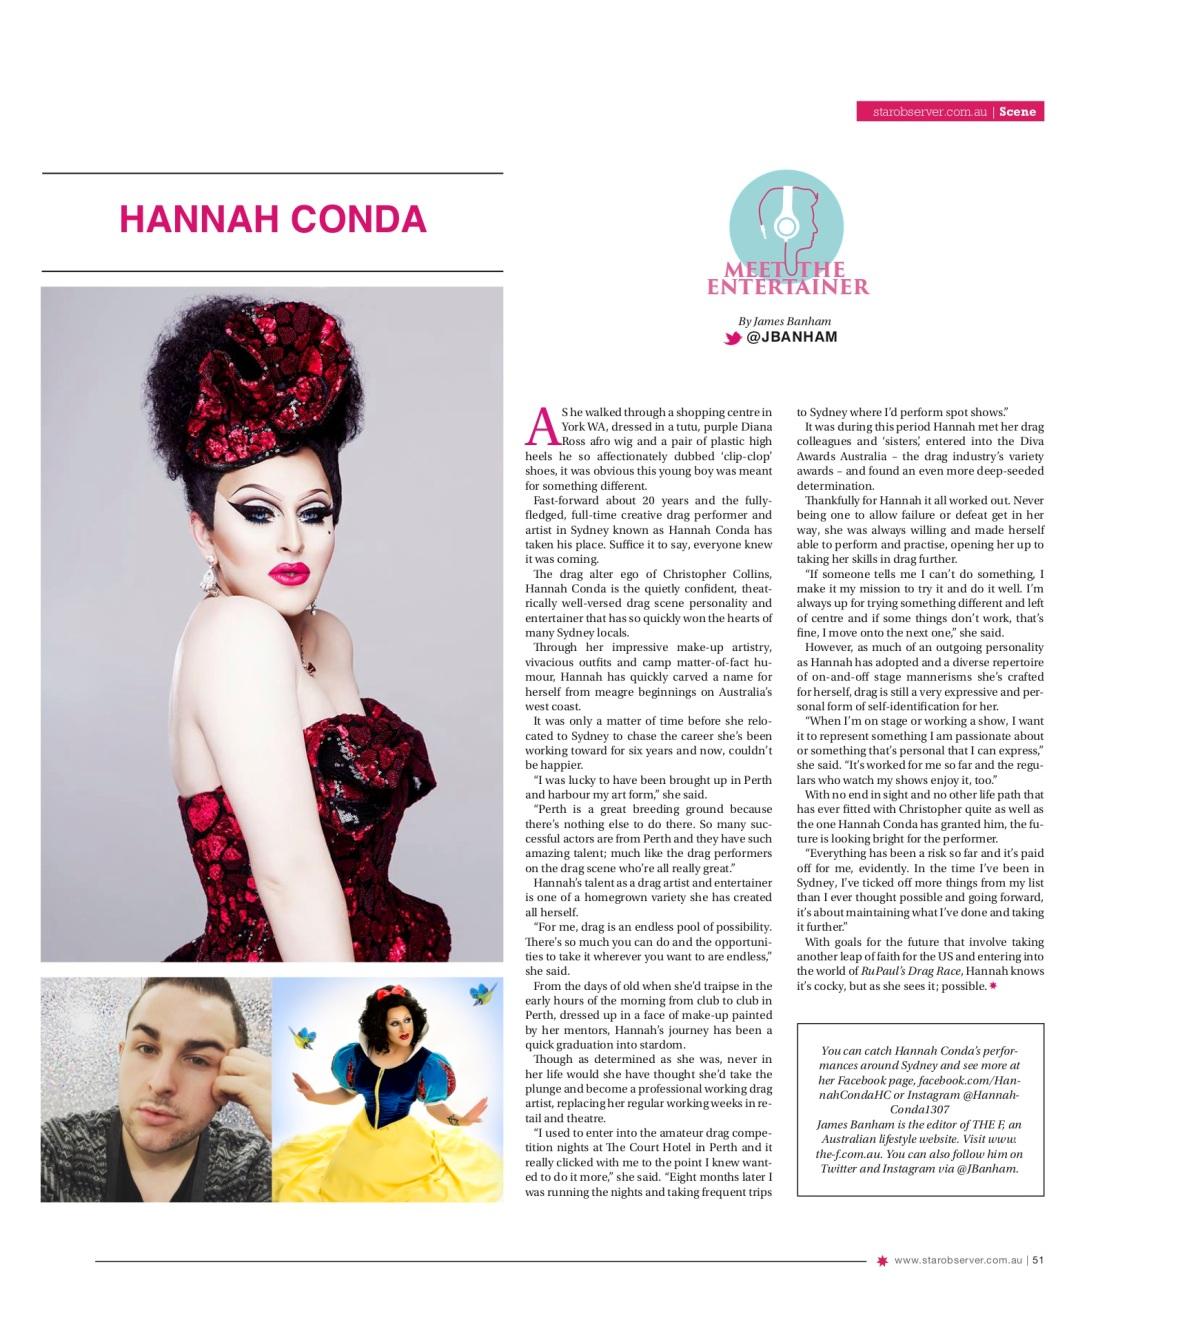 Hannah Conda Star Observer Magazine _ June 2016 story